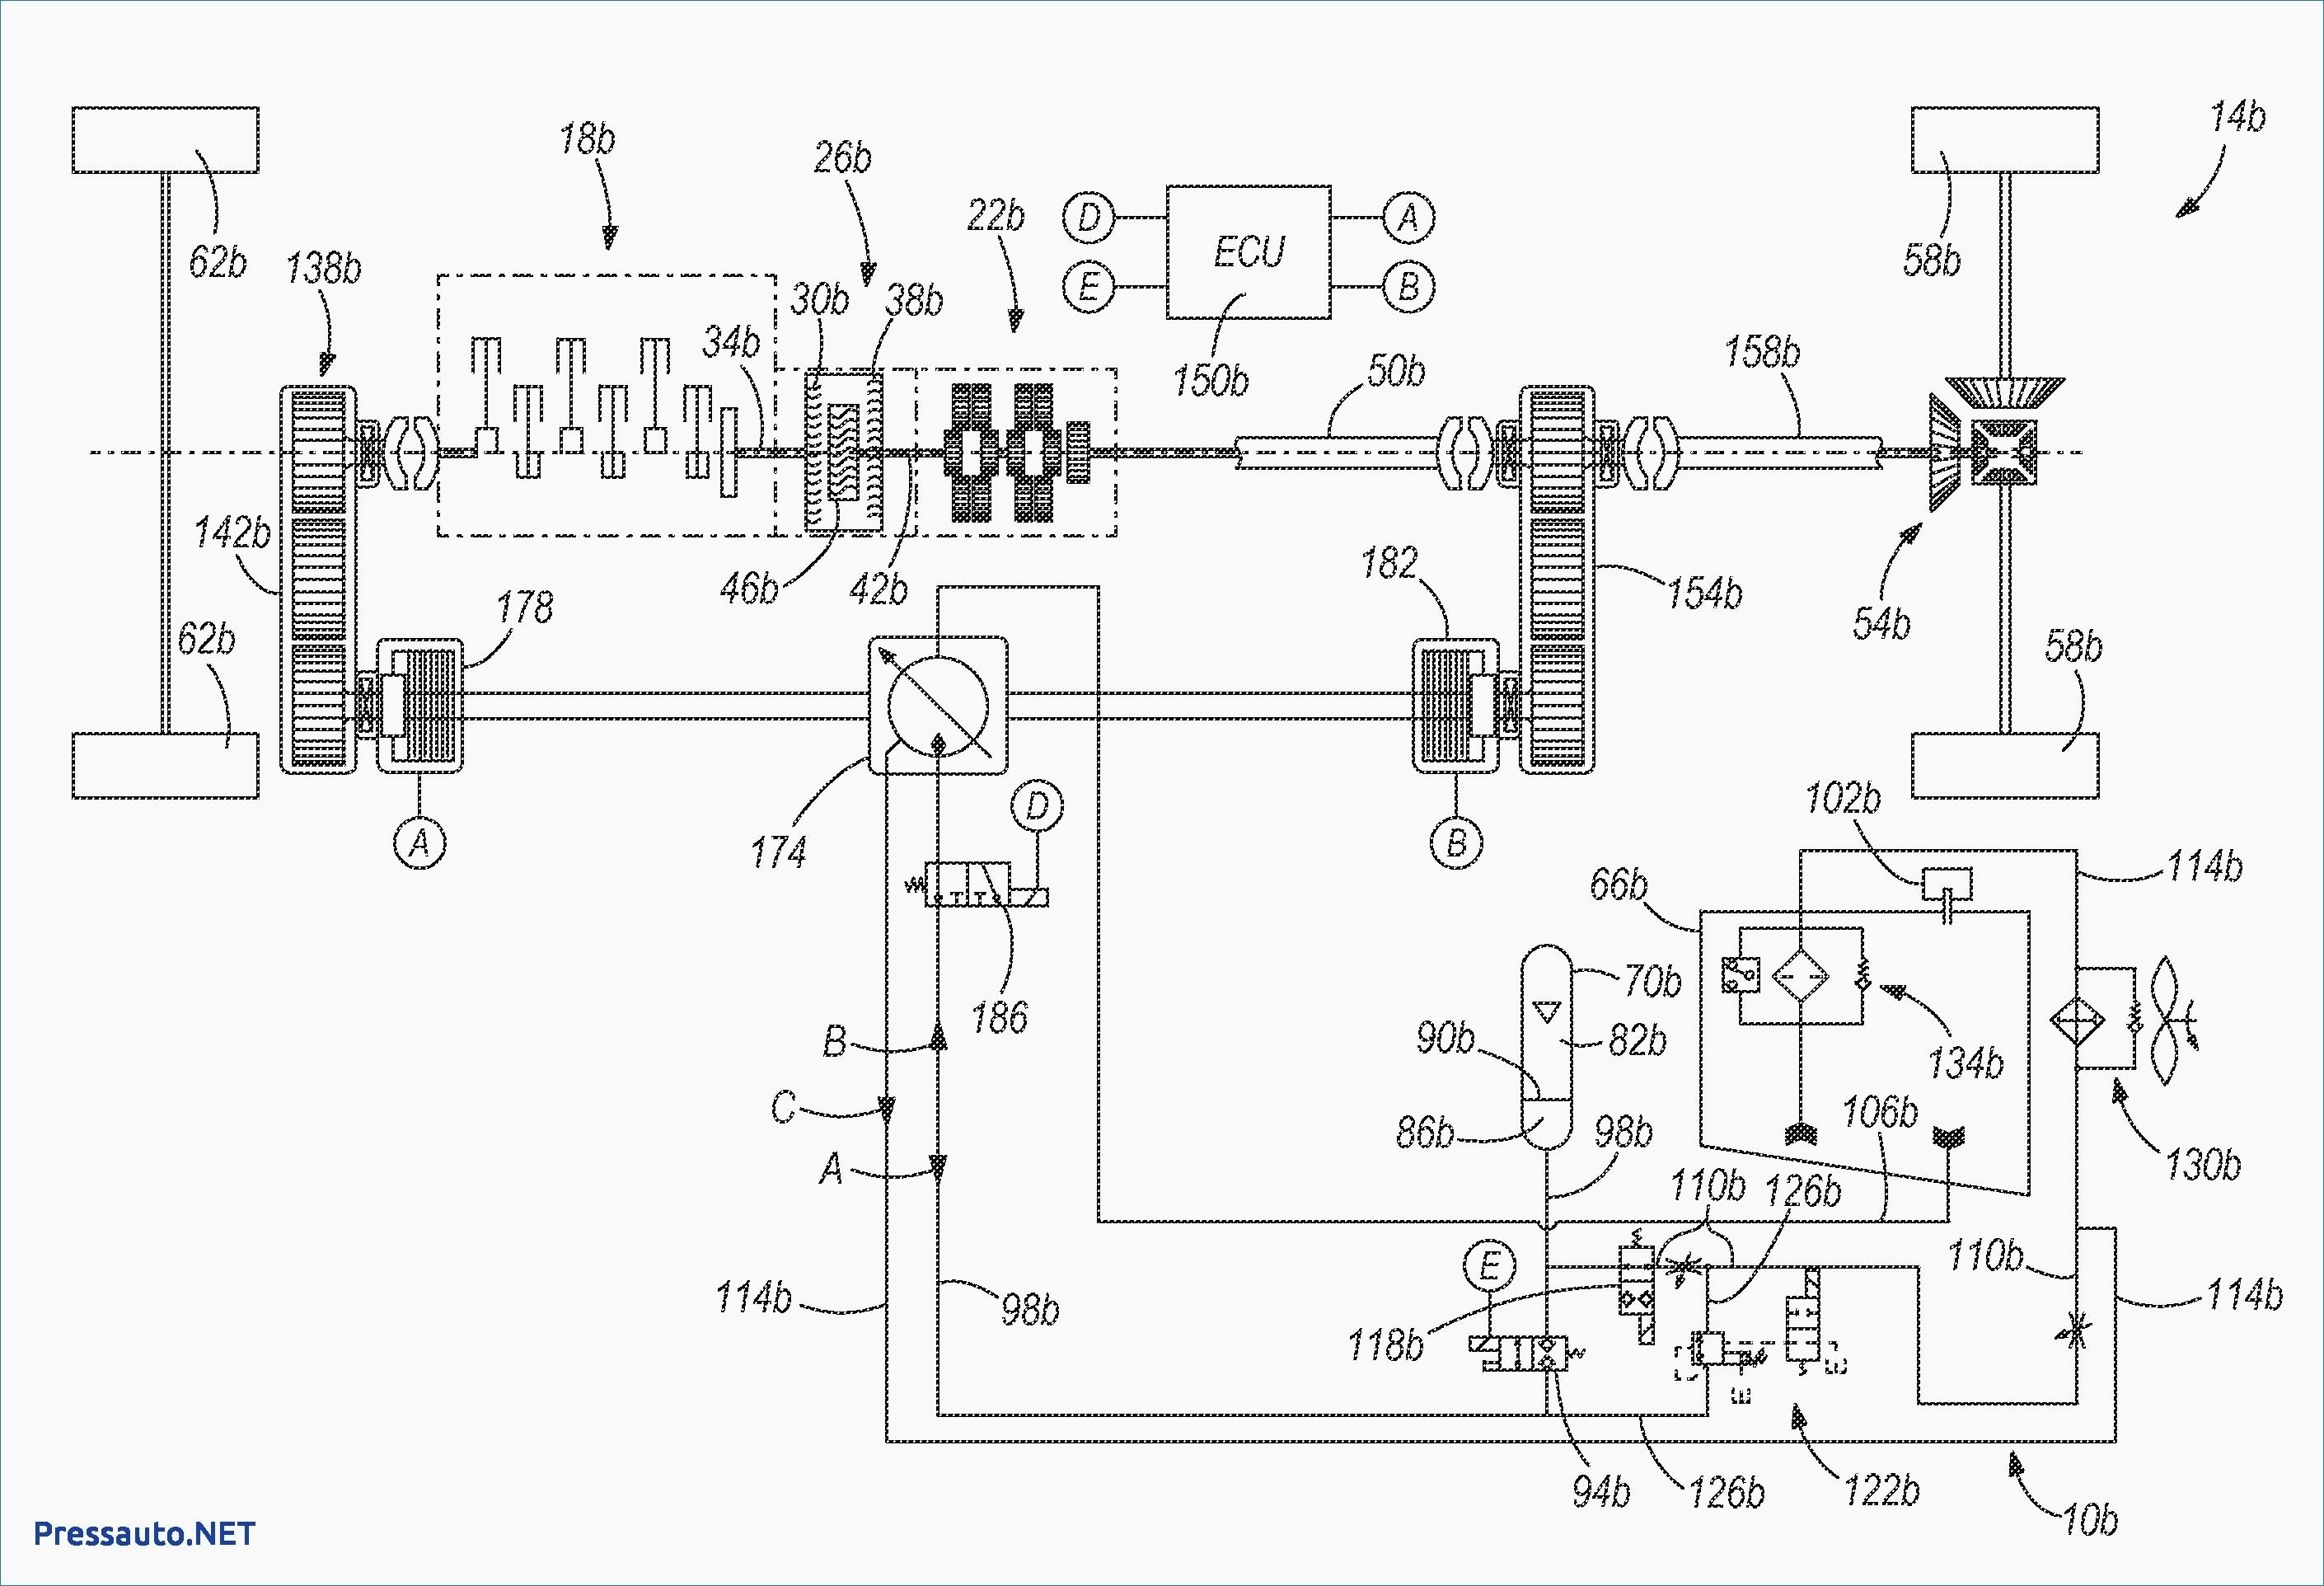 2007 international 4300 air conditioning wiring diagram hopkins trailer connector engine best library dt466 rh 94 akszer eu